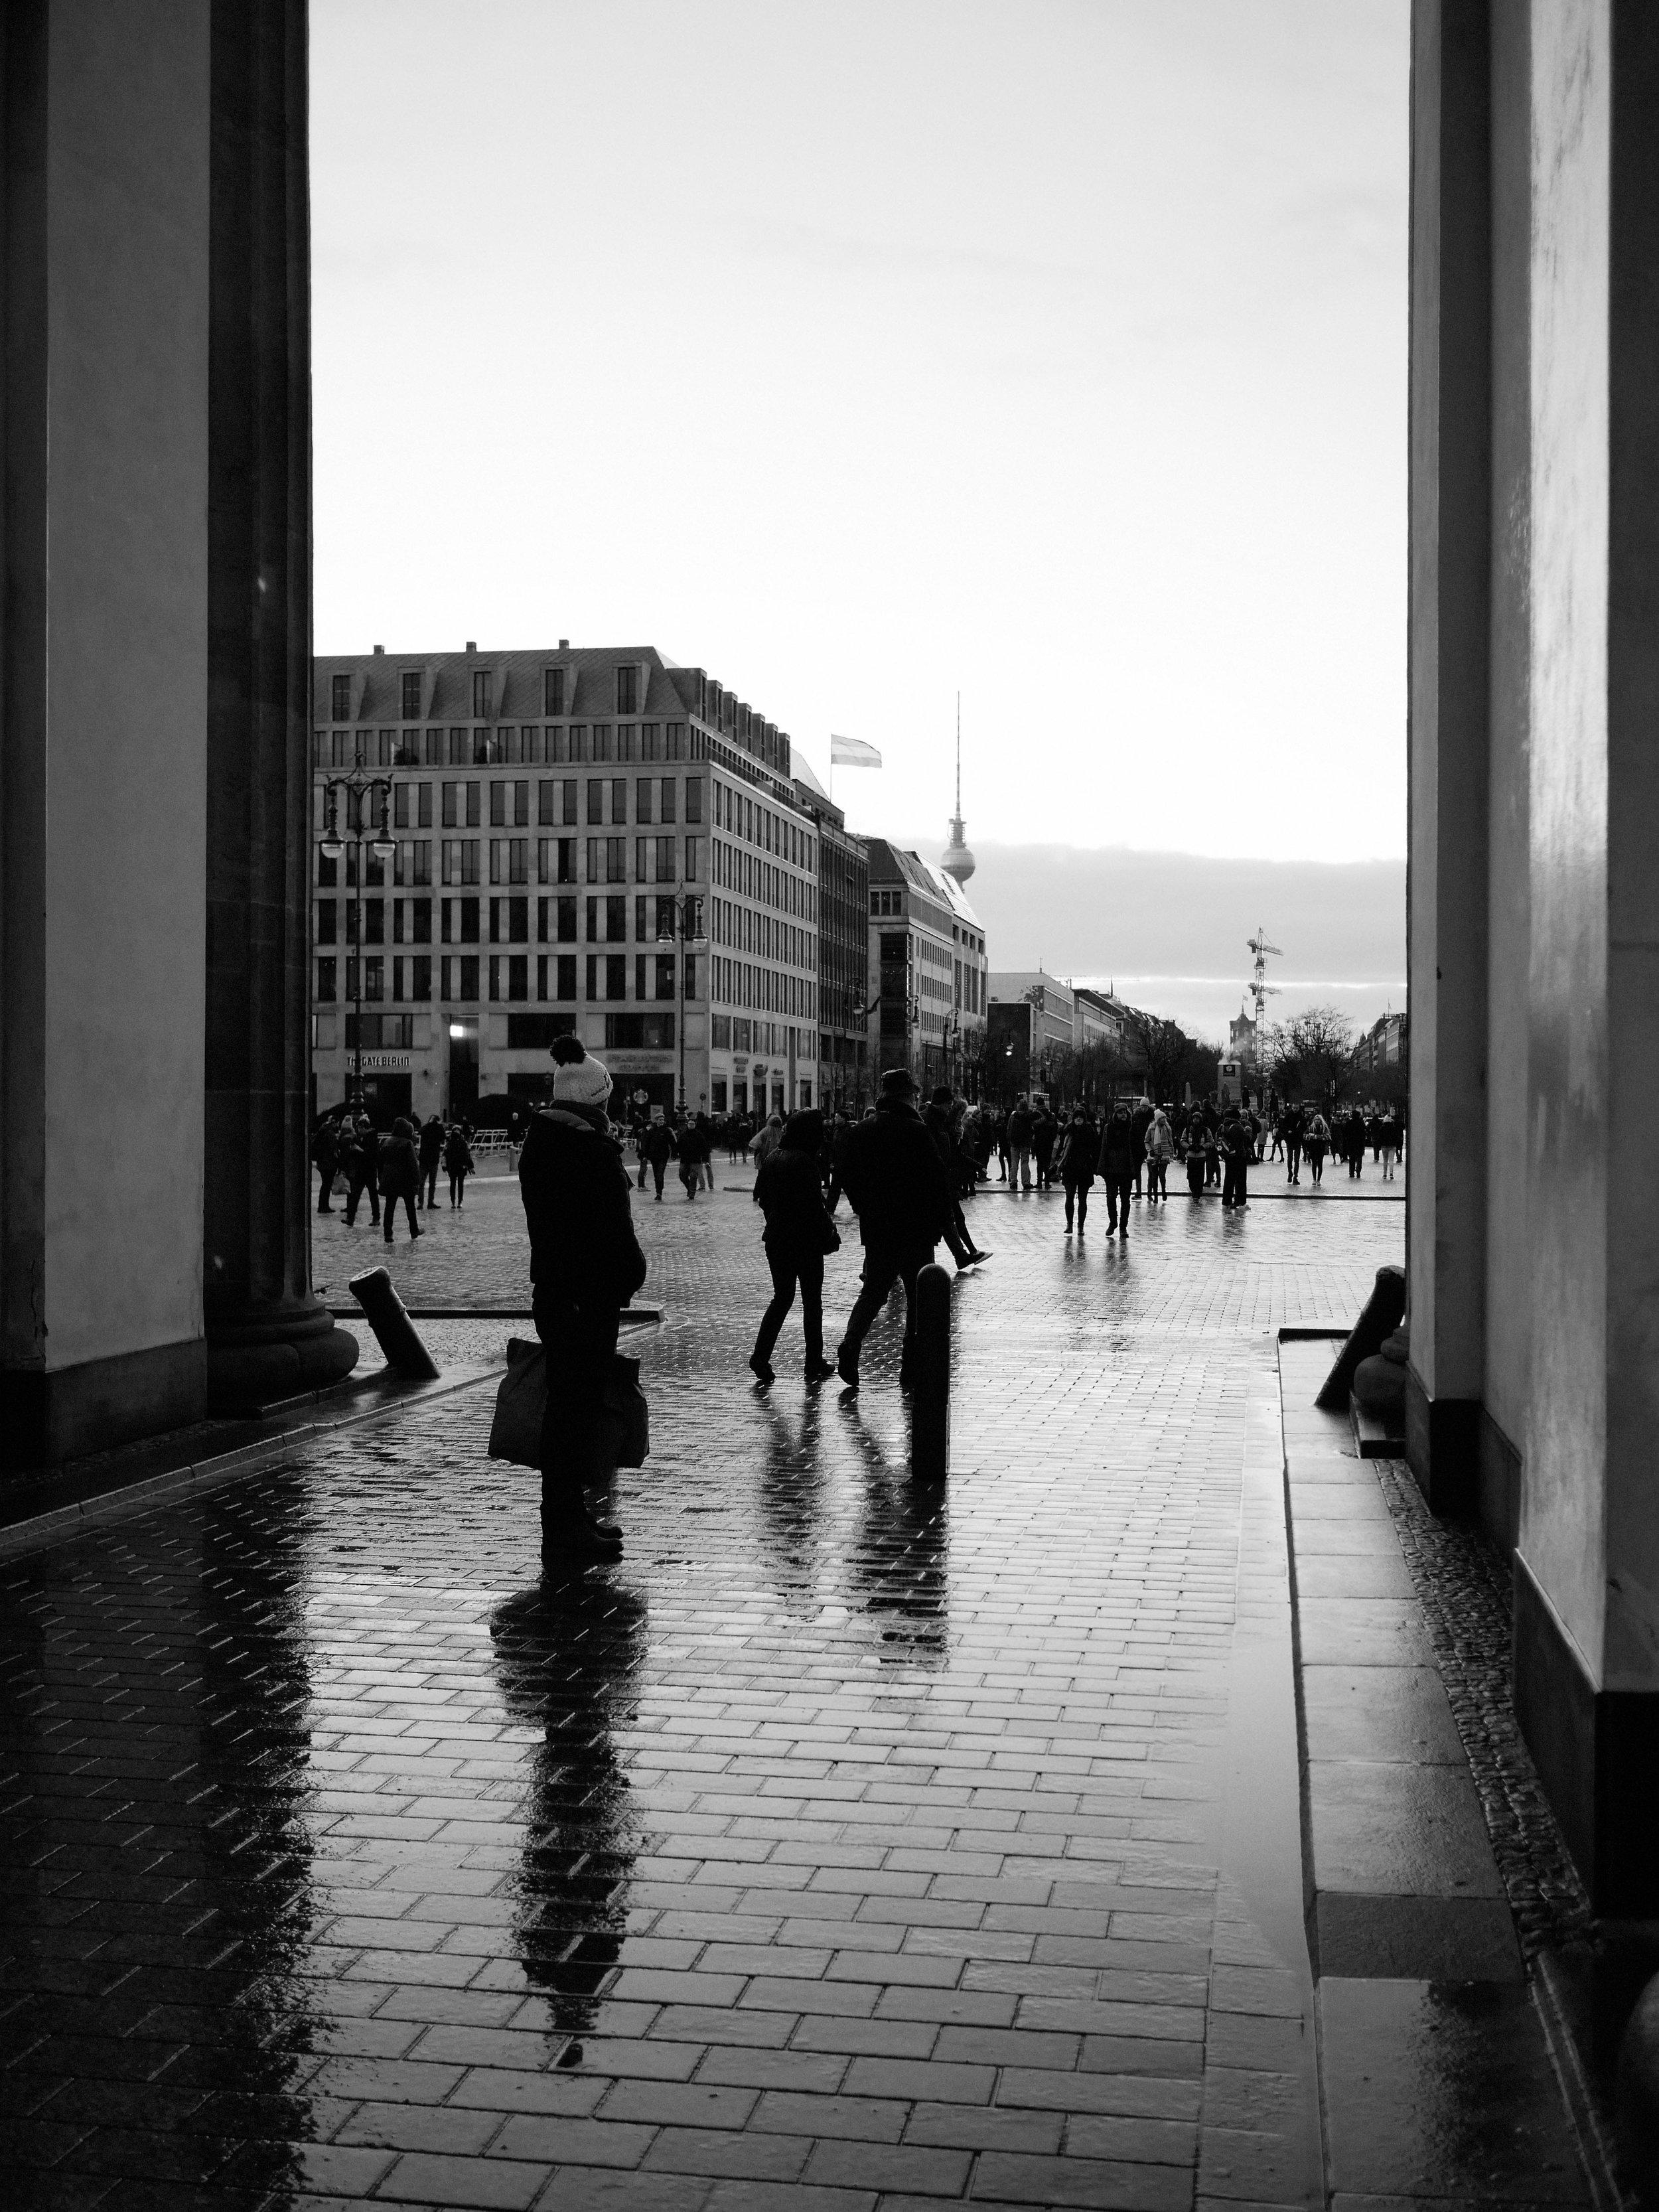 Berlin Brandenburger Tor Städtereise.jpg